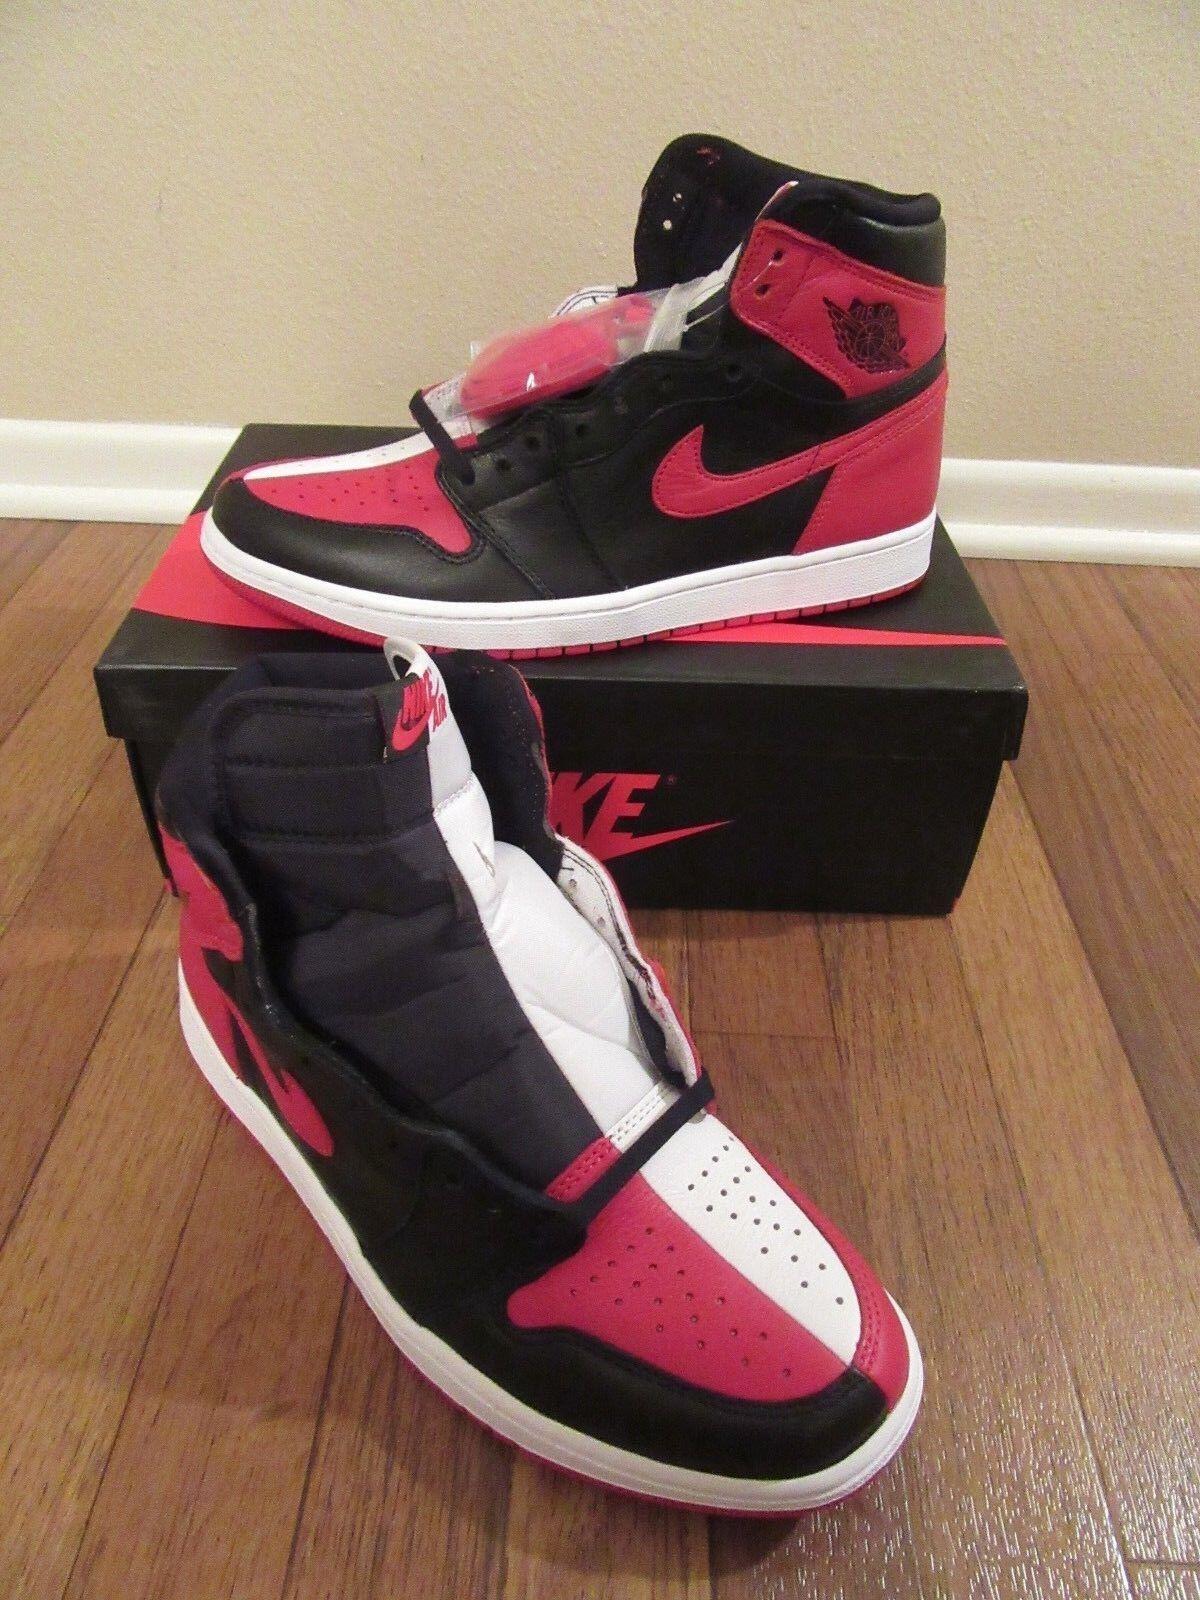 Nike Air Jordan NRG 1 retro High og NRG Jordan tamaño homenaje a casa 861428 061 DS New NIB 579b8e